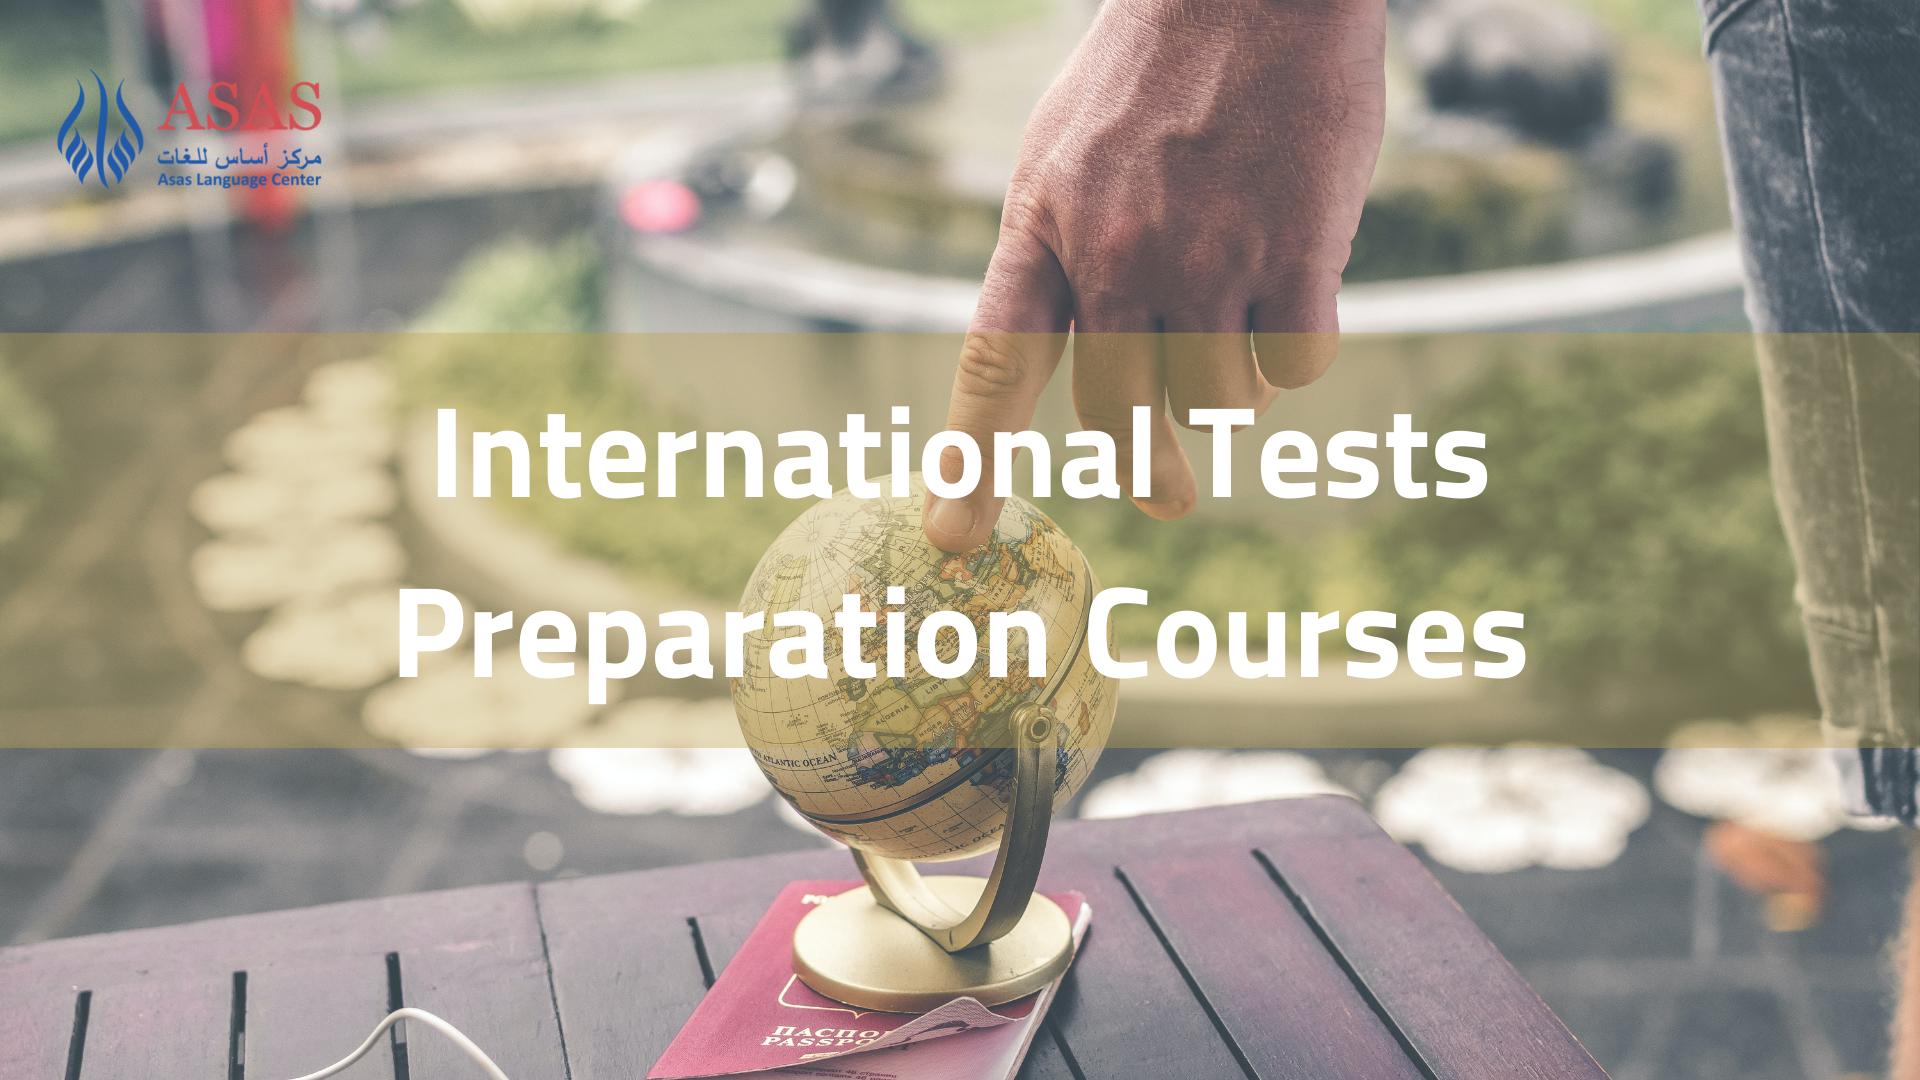 International Tests Preparation Courses